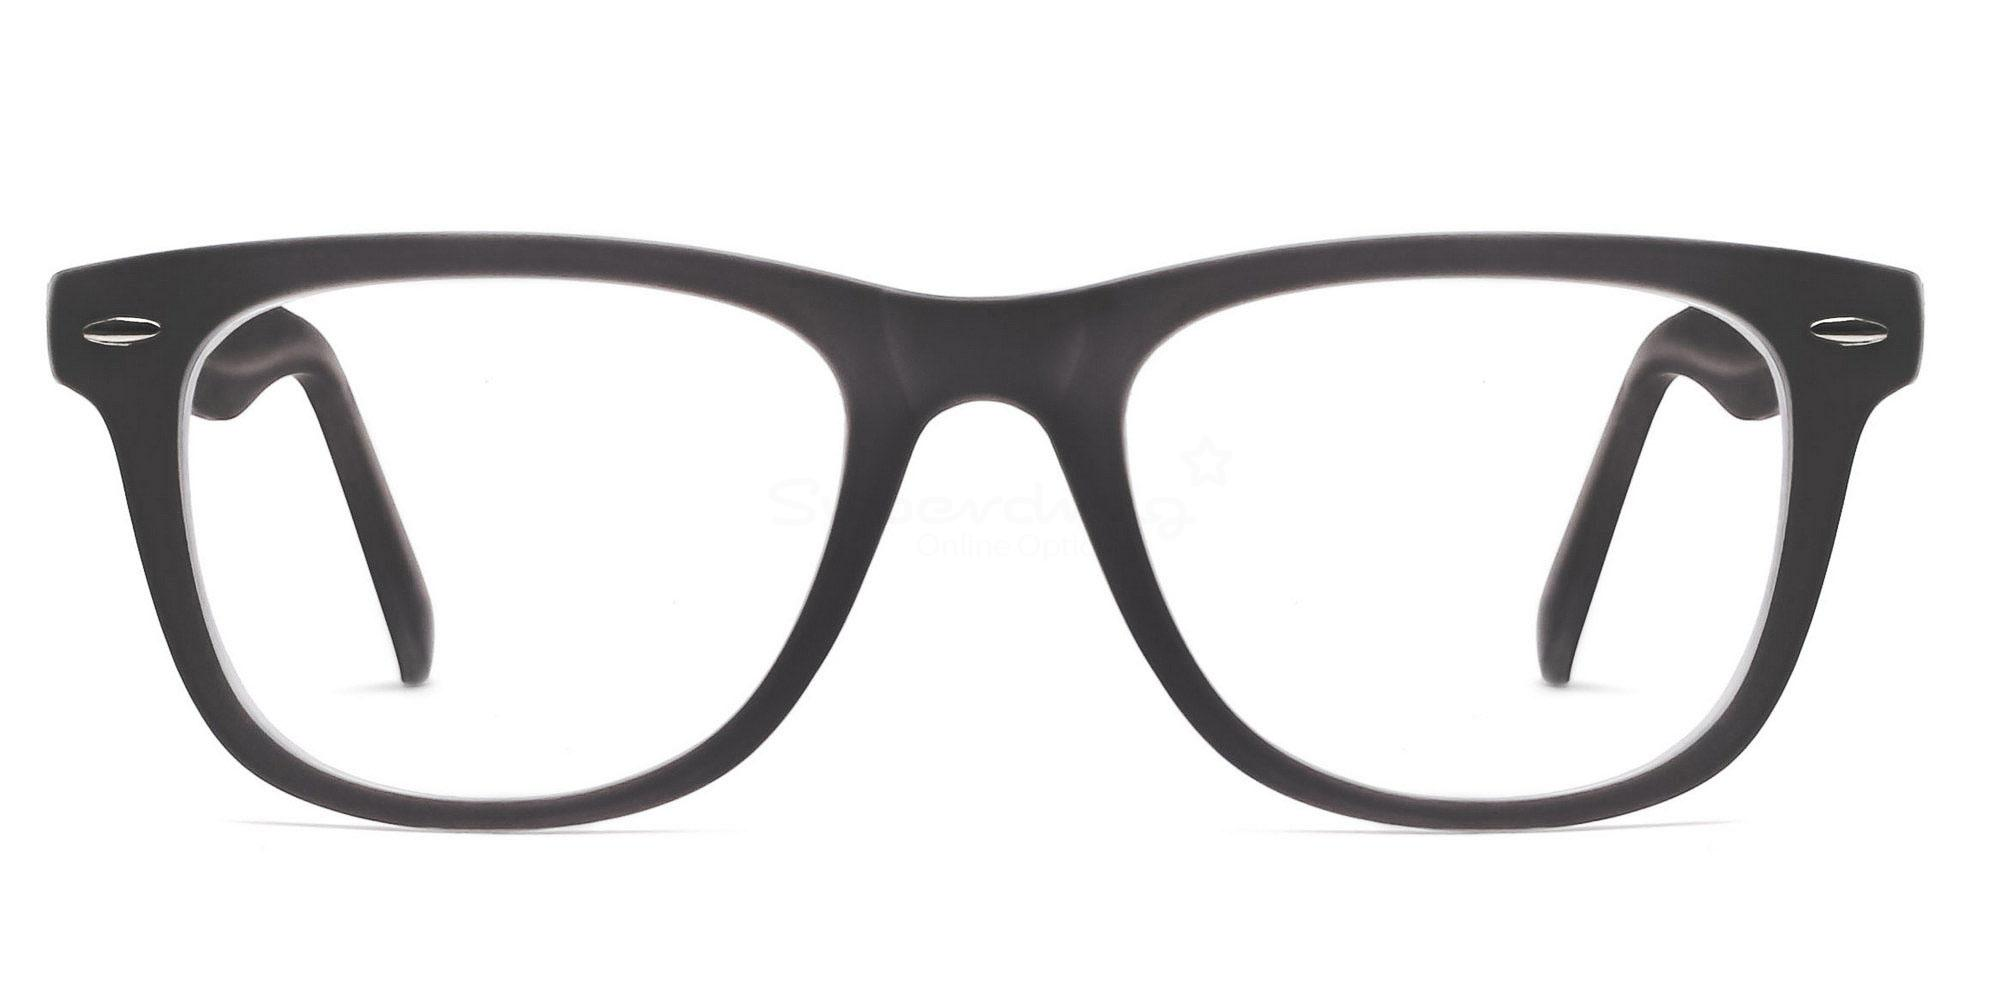 C11 8121 - Grey on Transparent Glasses, Helium